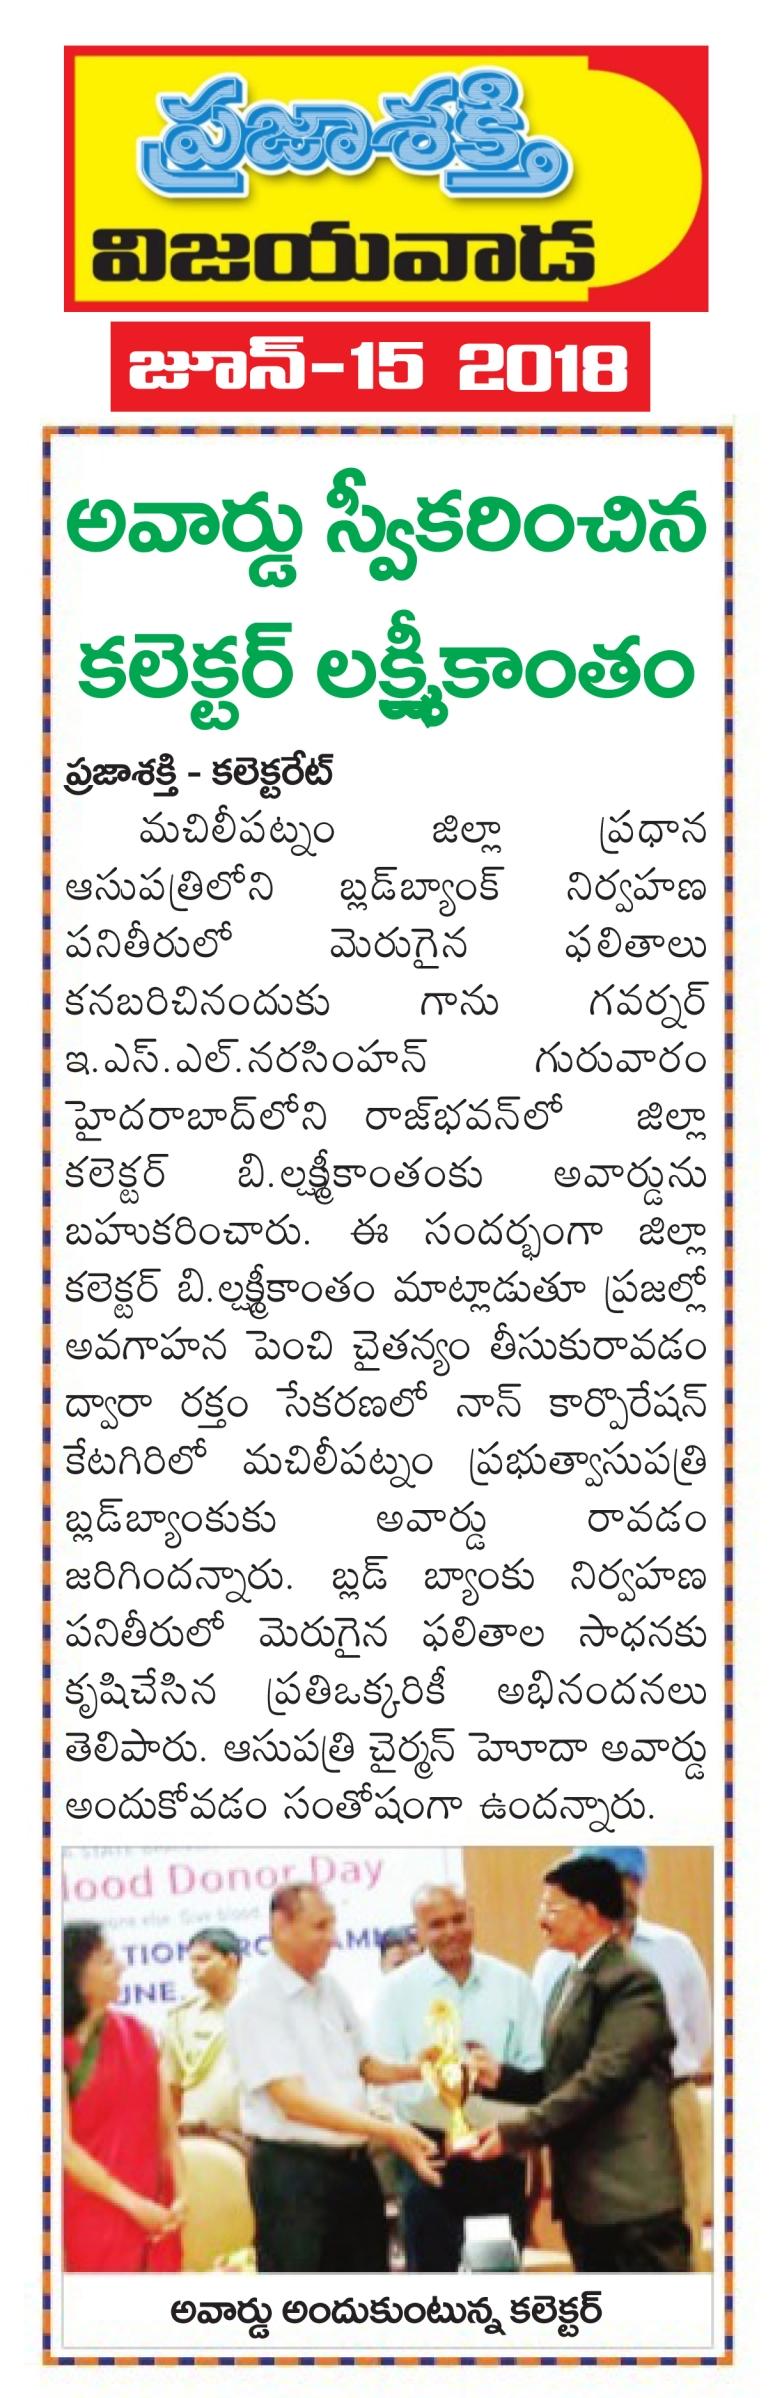 Award News Clip Prajasakti 15-06-2018